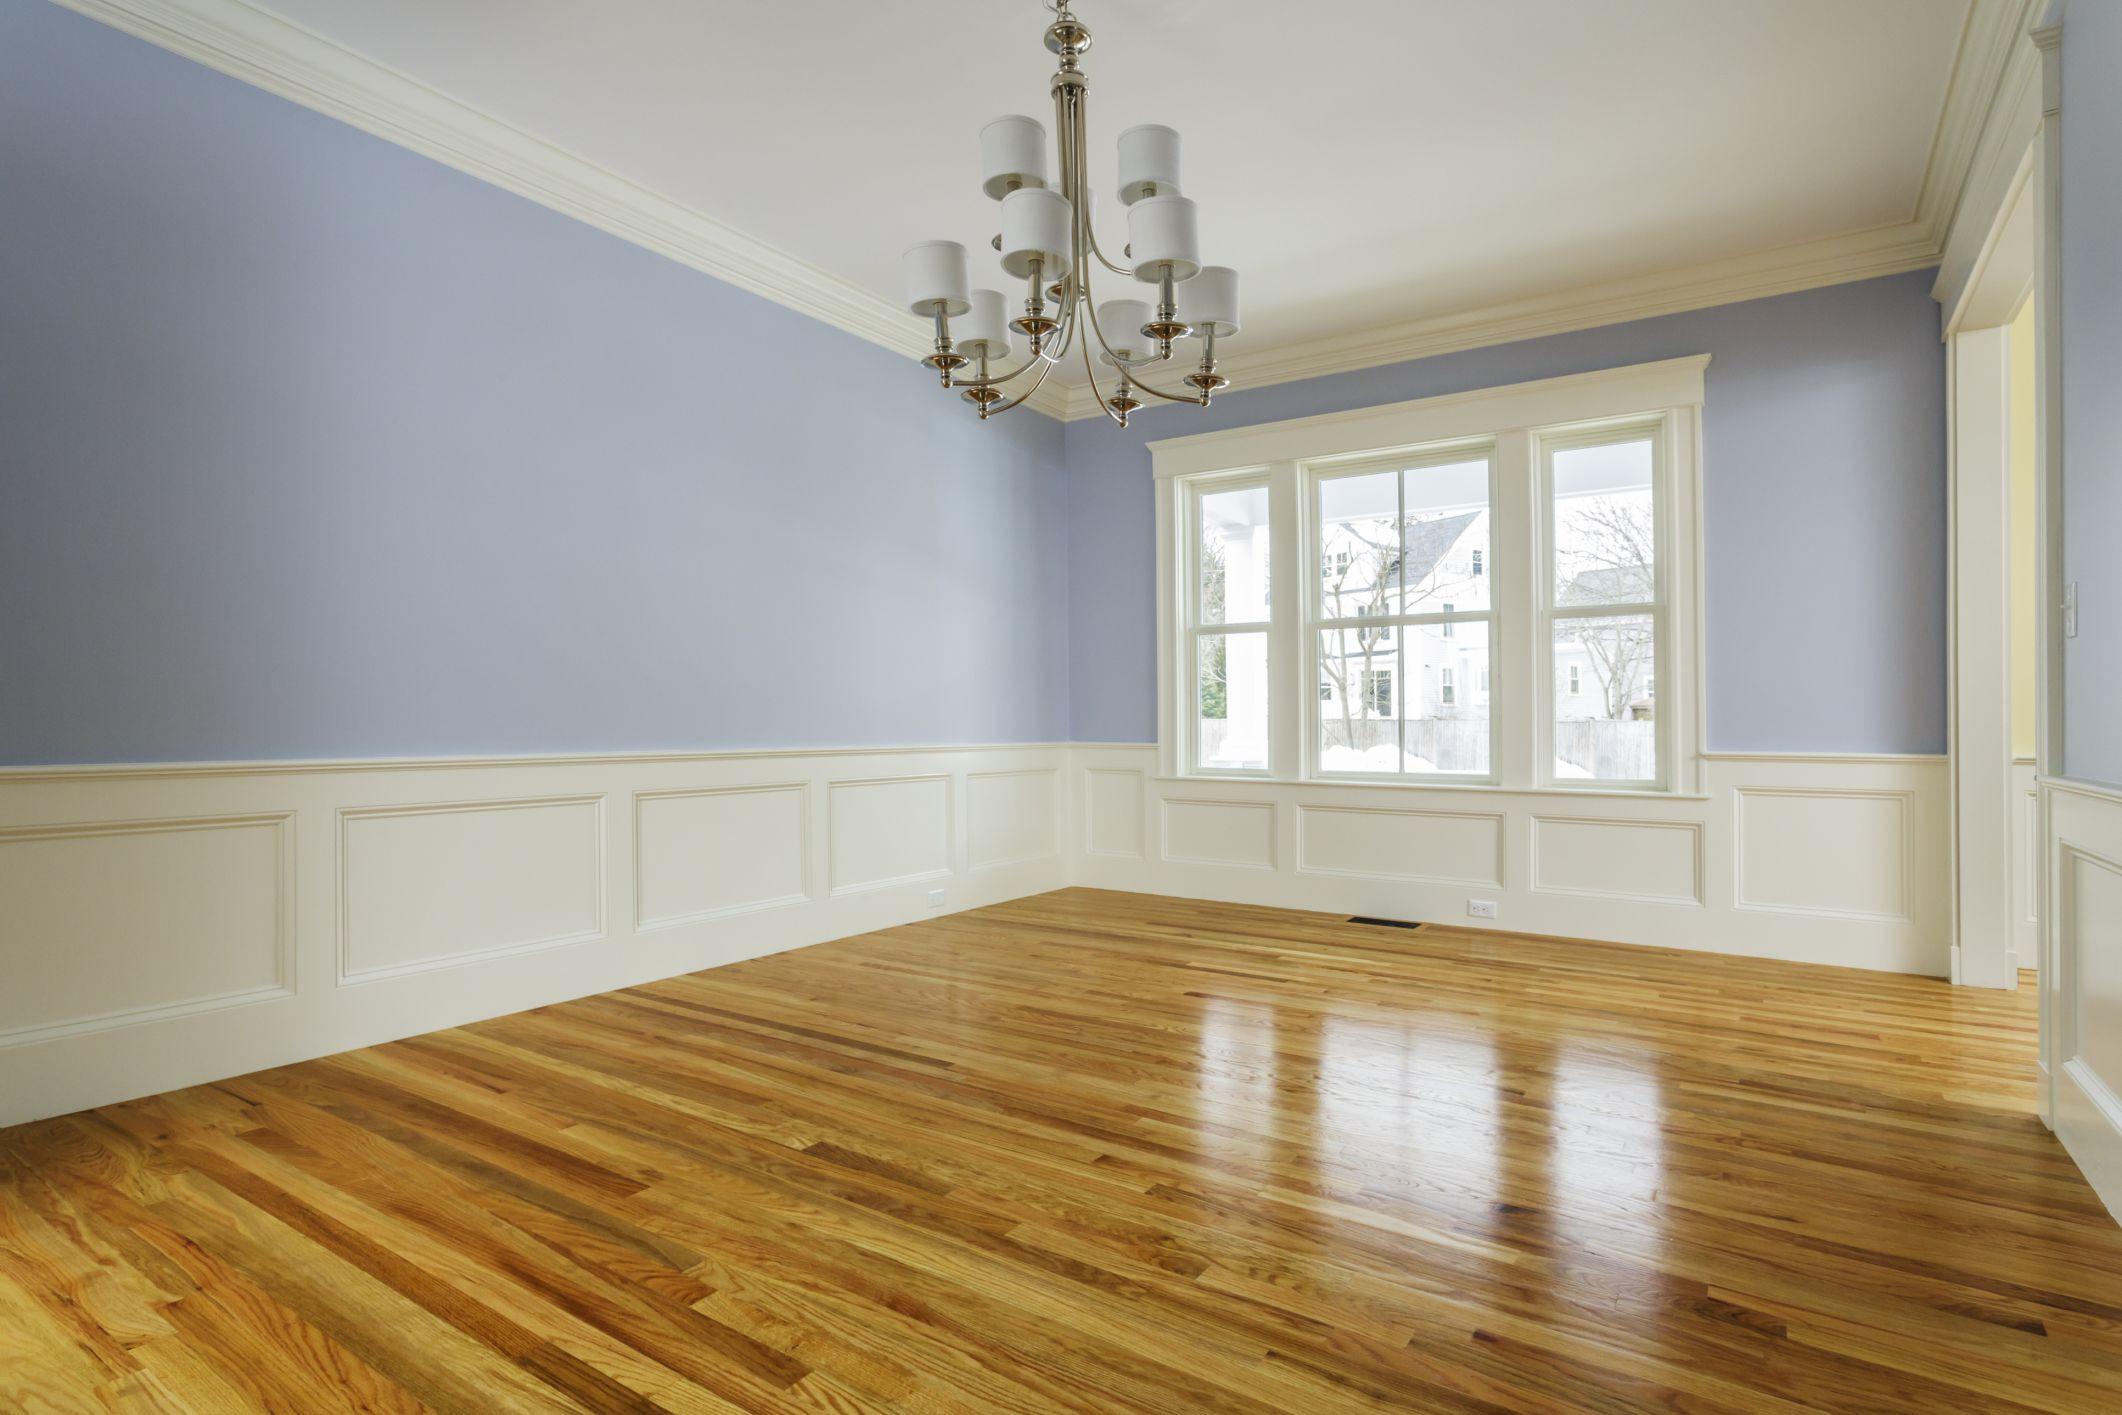 hardwood floor refinishing price calculator of the cost to refinish hardwood floors in 168686572 highres 56a2fd773df78cf7727b6cb3